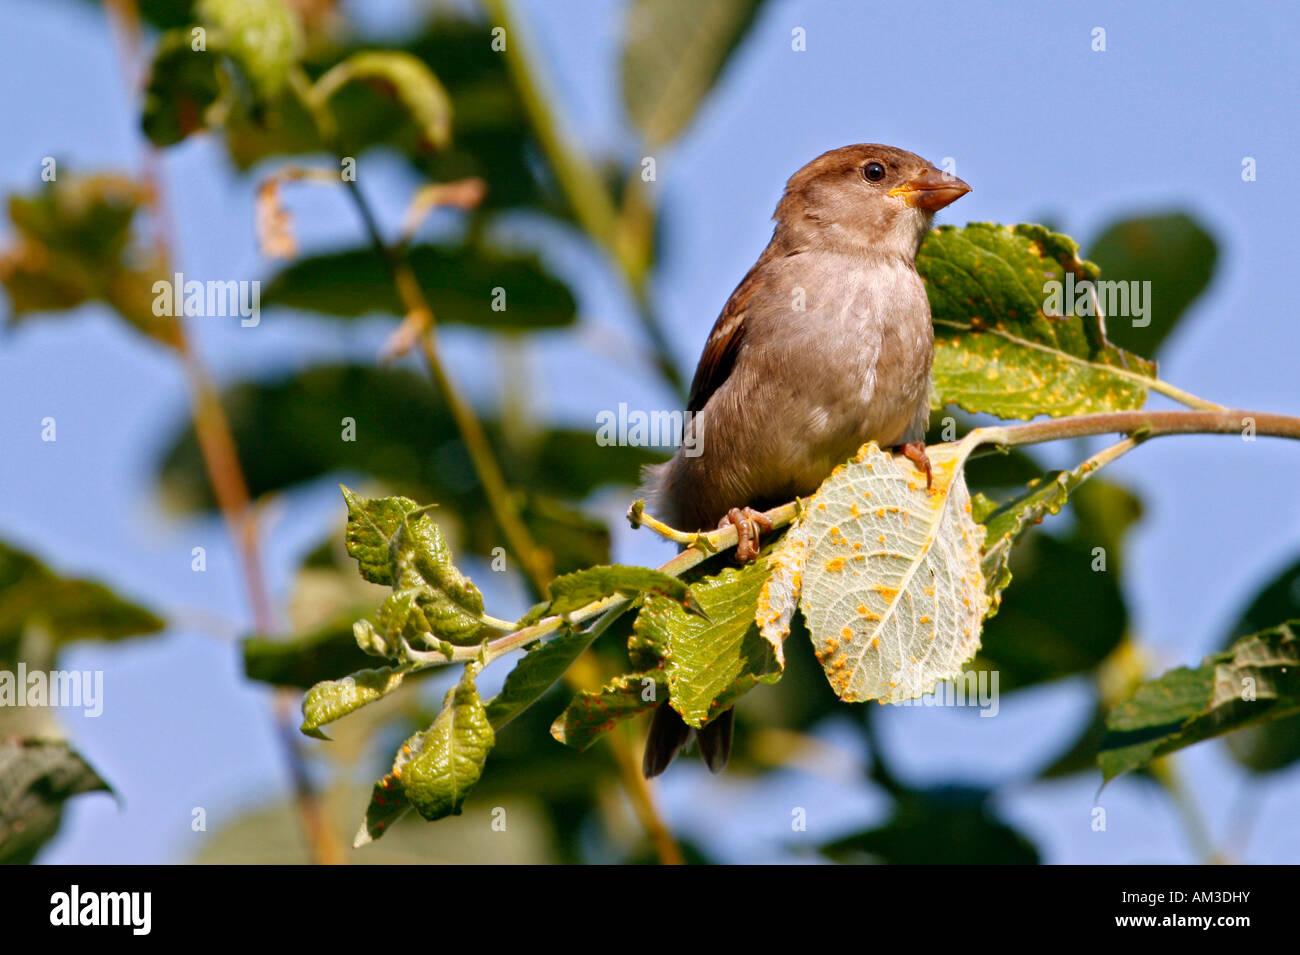 Bird, singing bird, sparrow Stock Photo